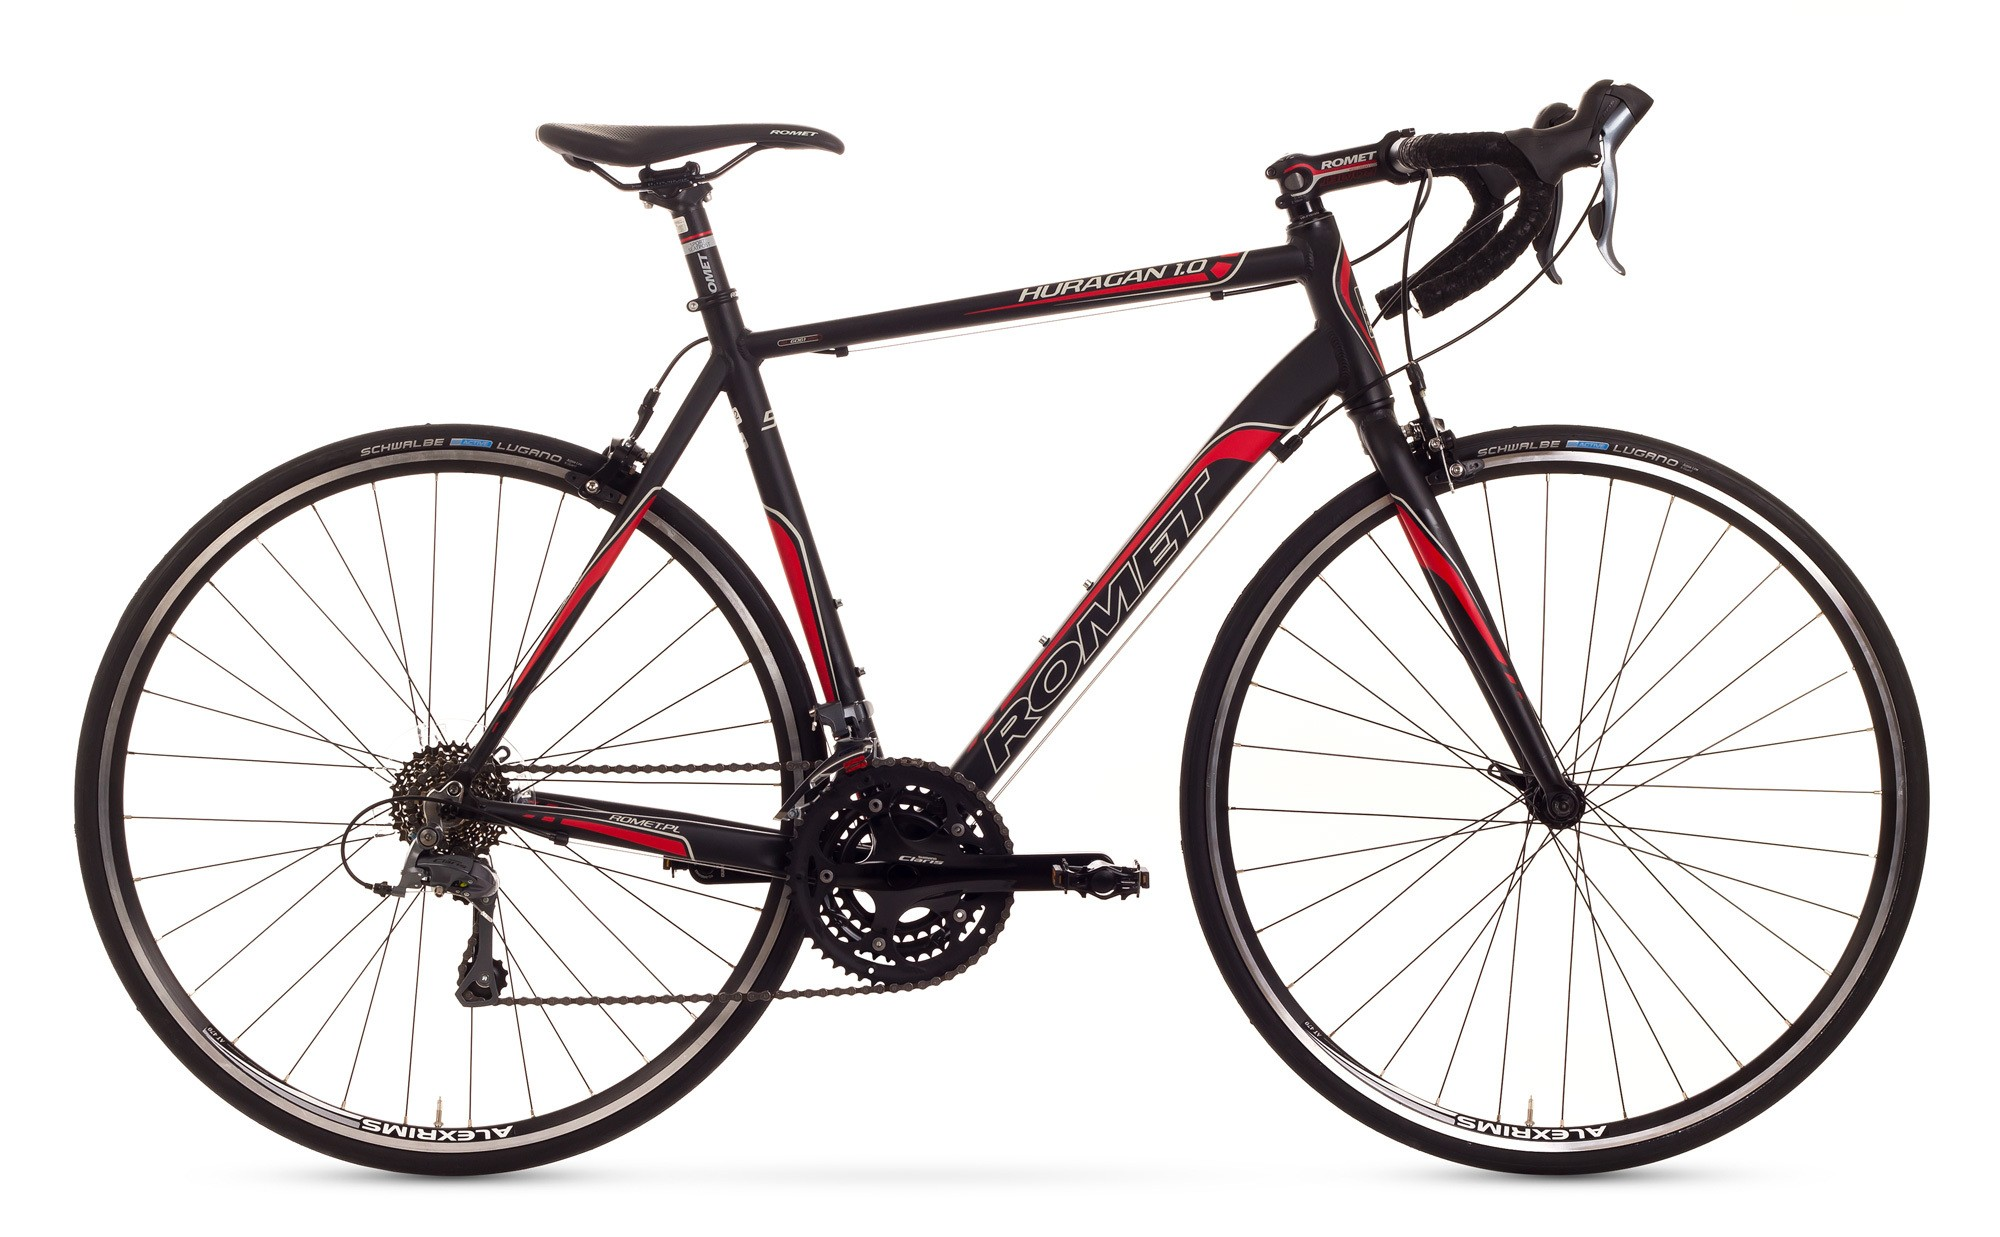 Bicicleta cursiera Romet Huragan 1.0 - negru-rosu